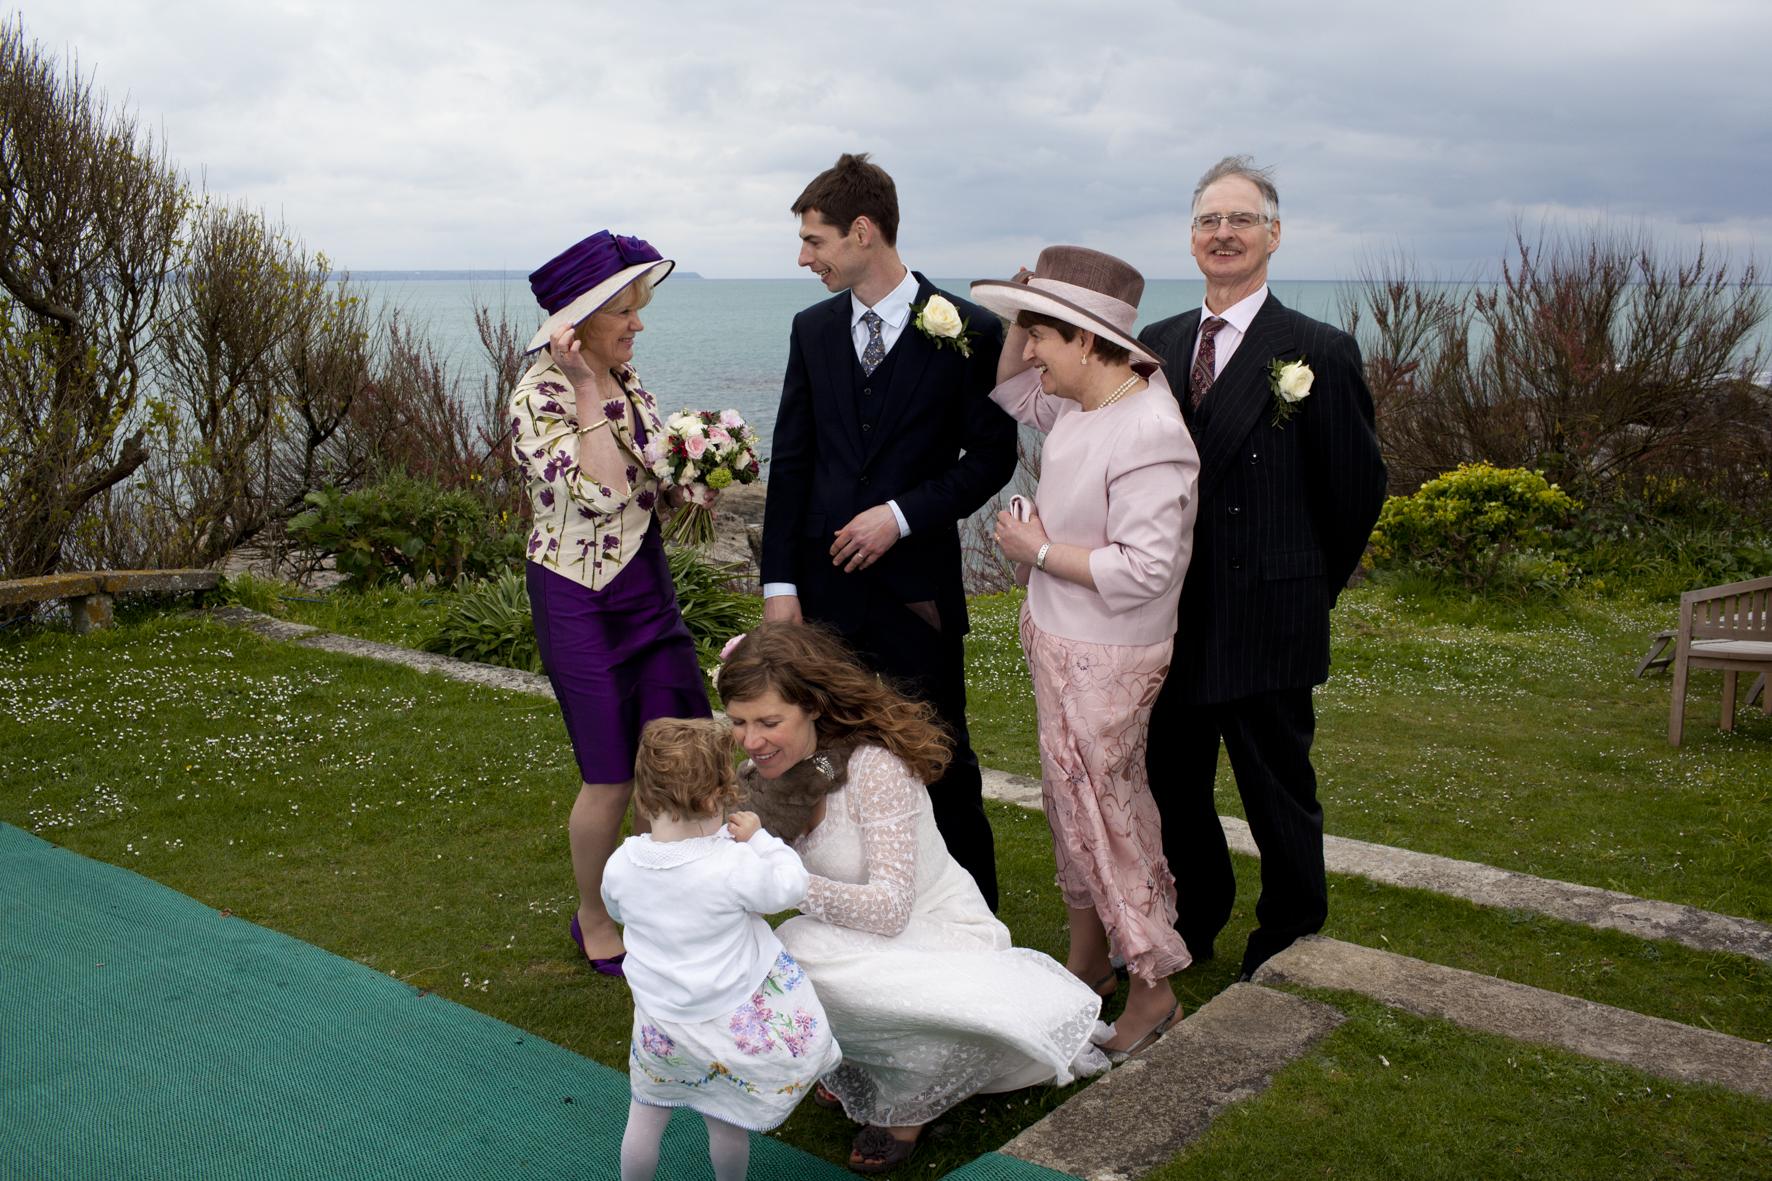 Wedding example_M&P__MG_3690_Claudia Leisinger.jpg